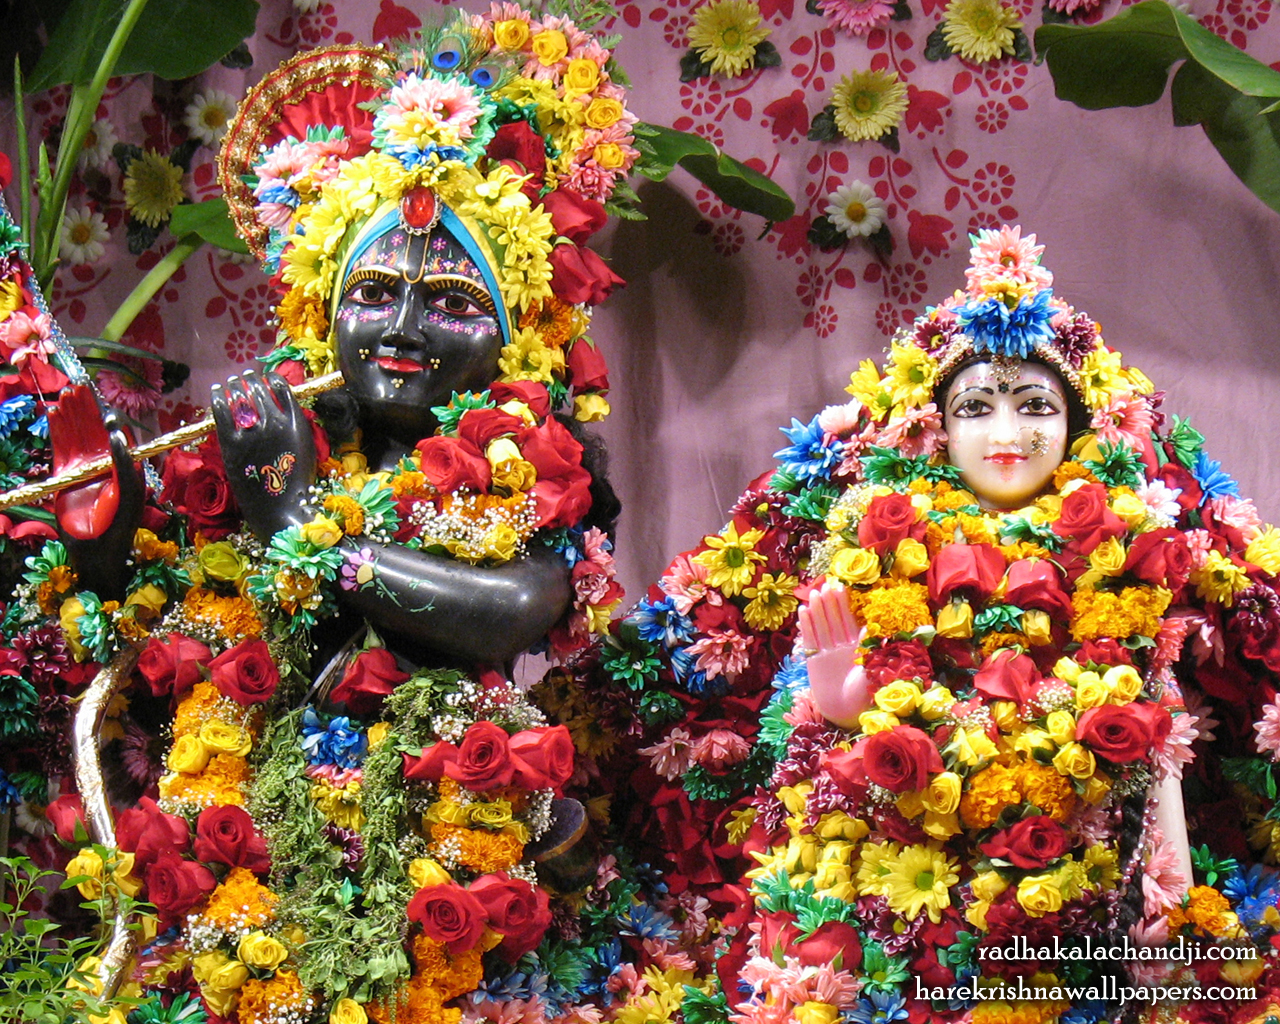 Sri Sri Radha Kalachanda Close up Wallpaper (001) Size 1280x1024 Download